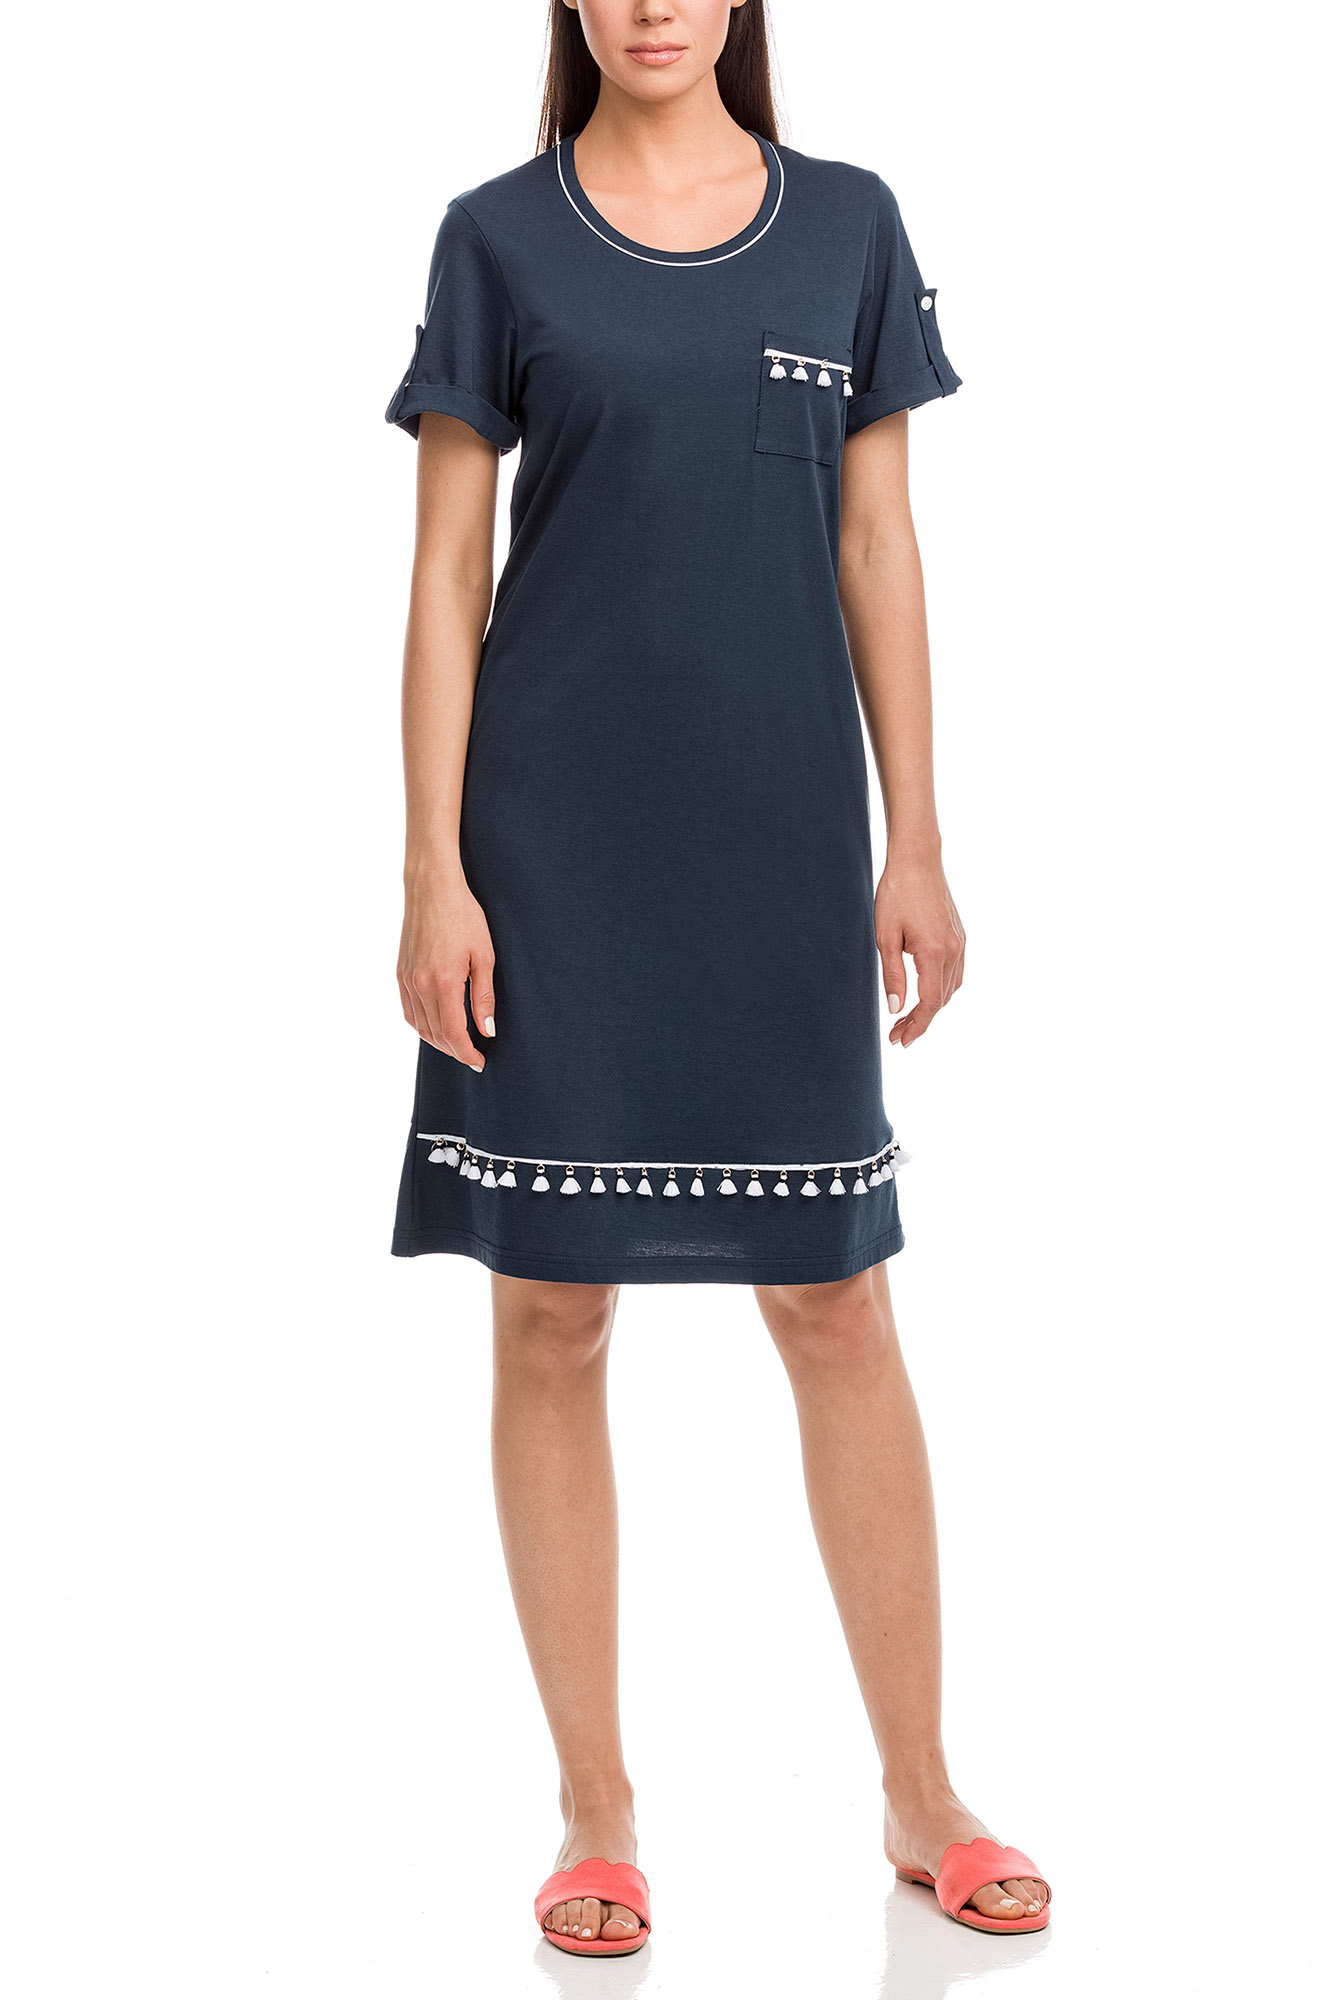 Vamp - Dámske šaty 12595 - Vamp blue oxford xl